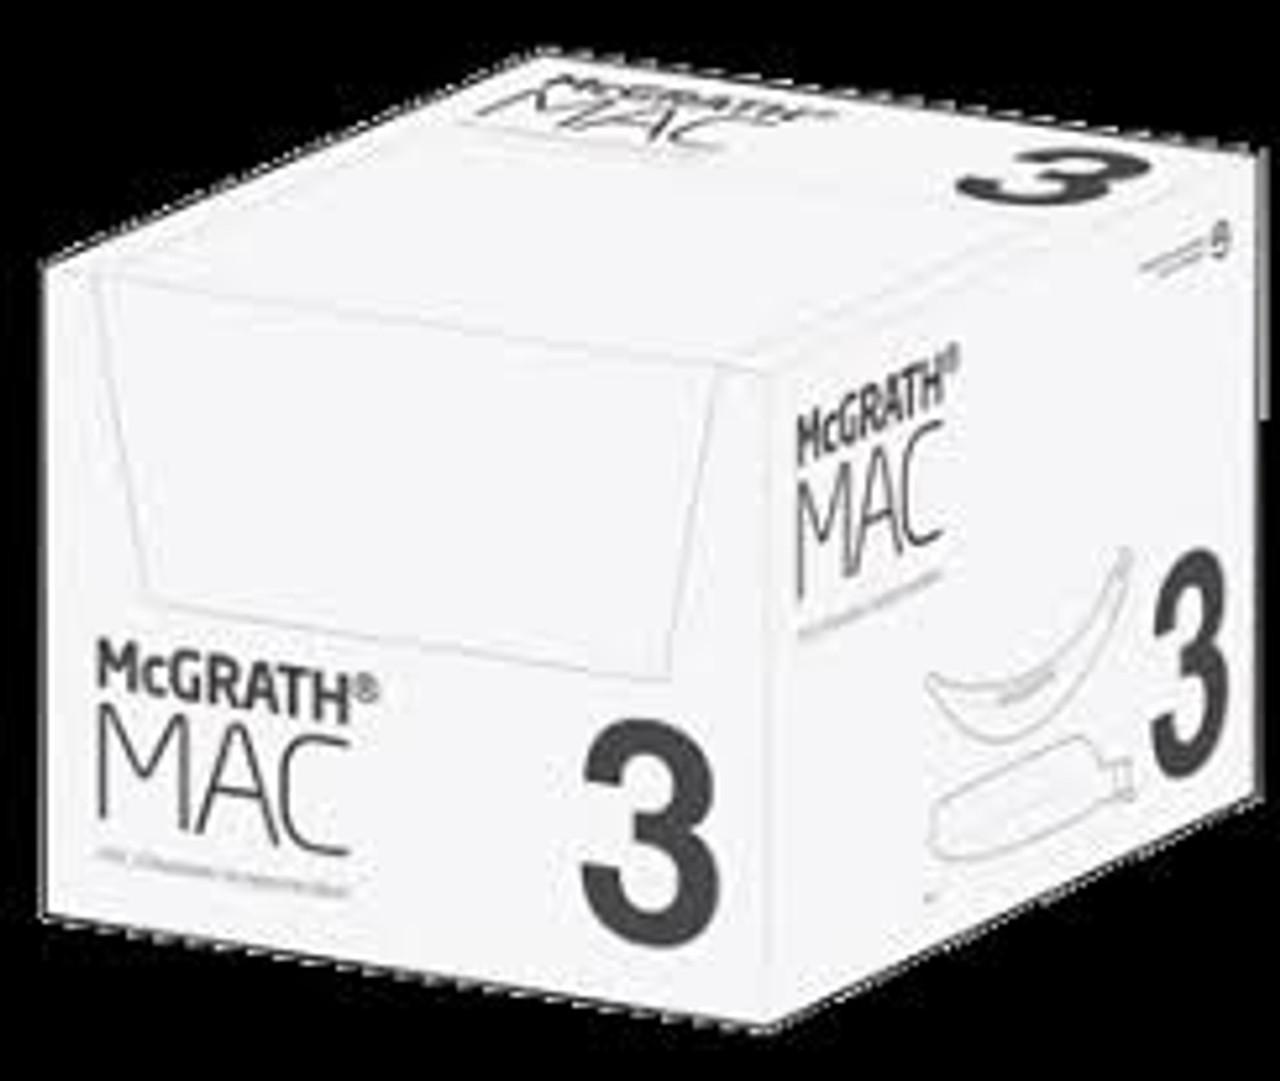 McGRATH™ Mac 3 Video Laryngoscope Blade by Physio-Control